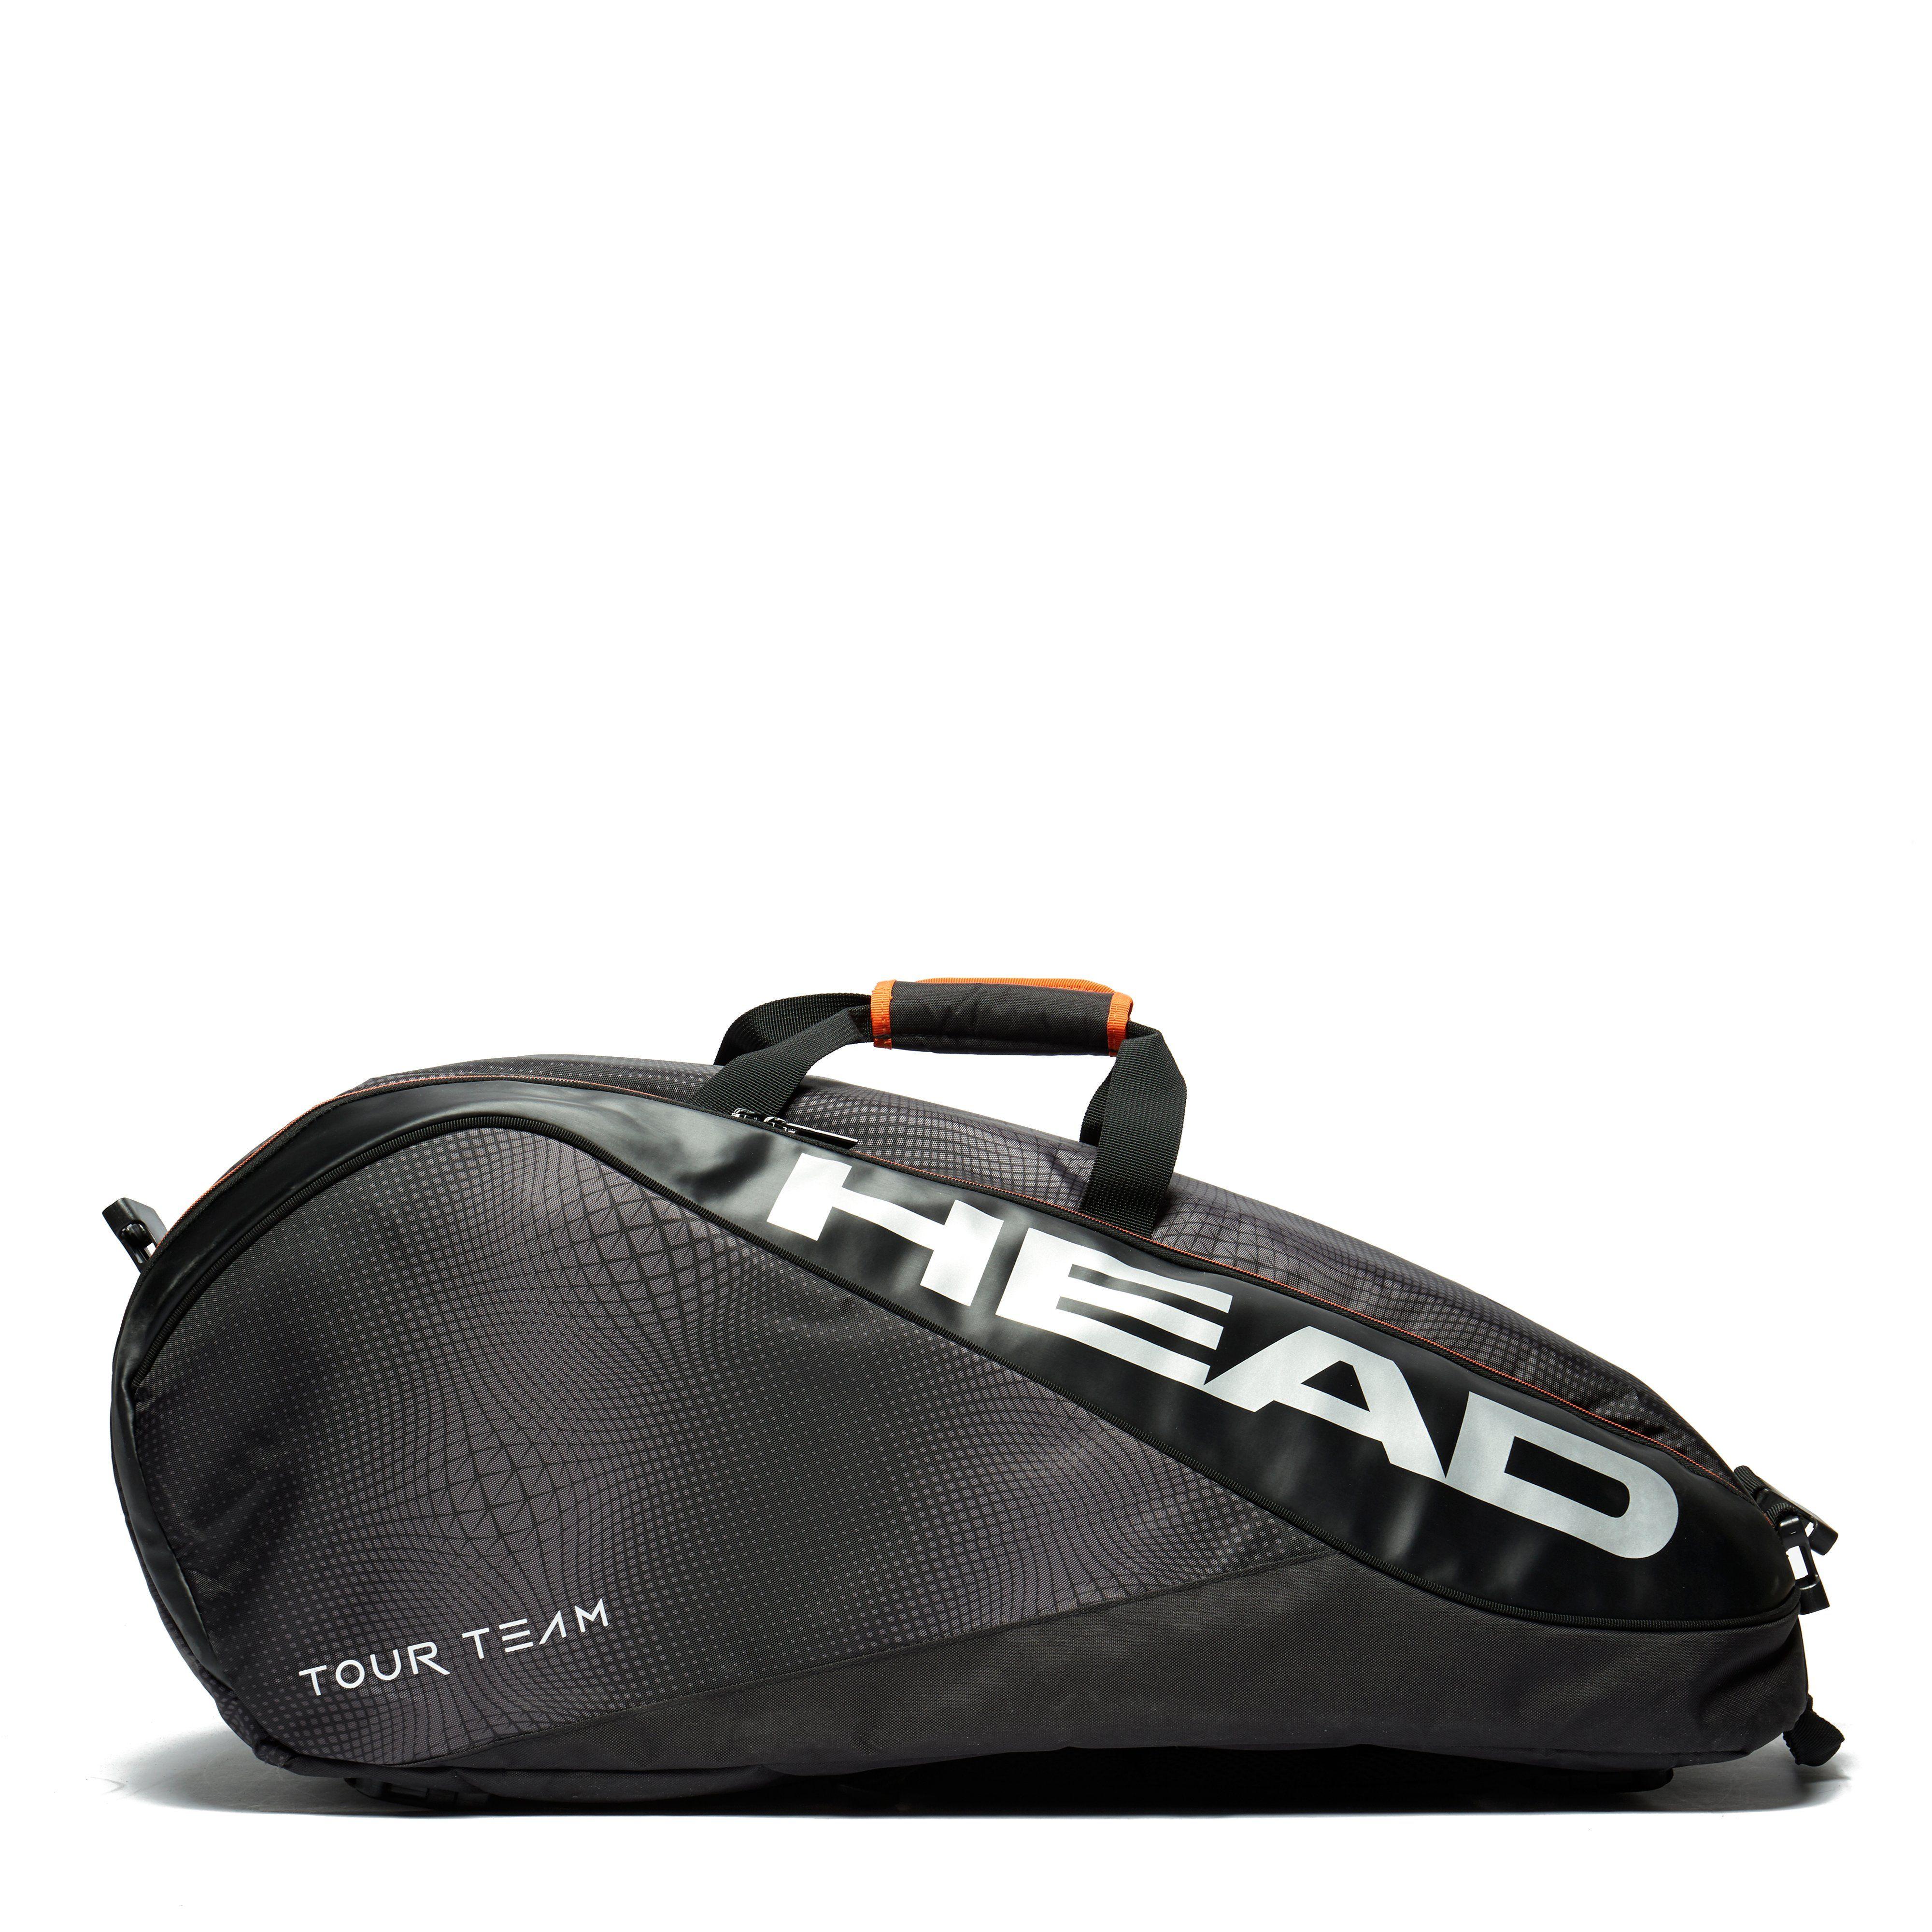 Head Tour Team 9R Supercombi Racket Bag